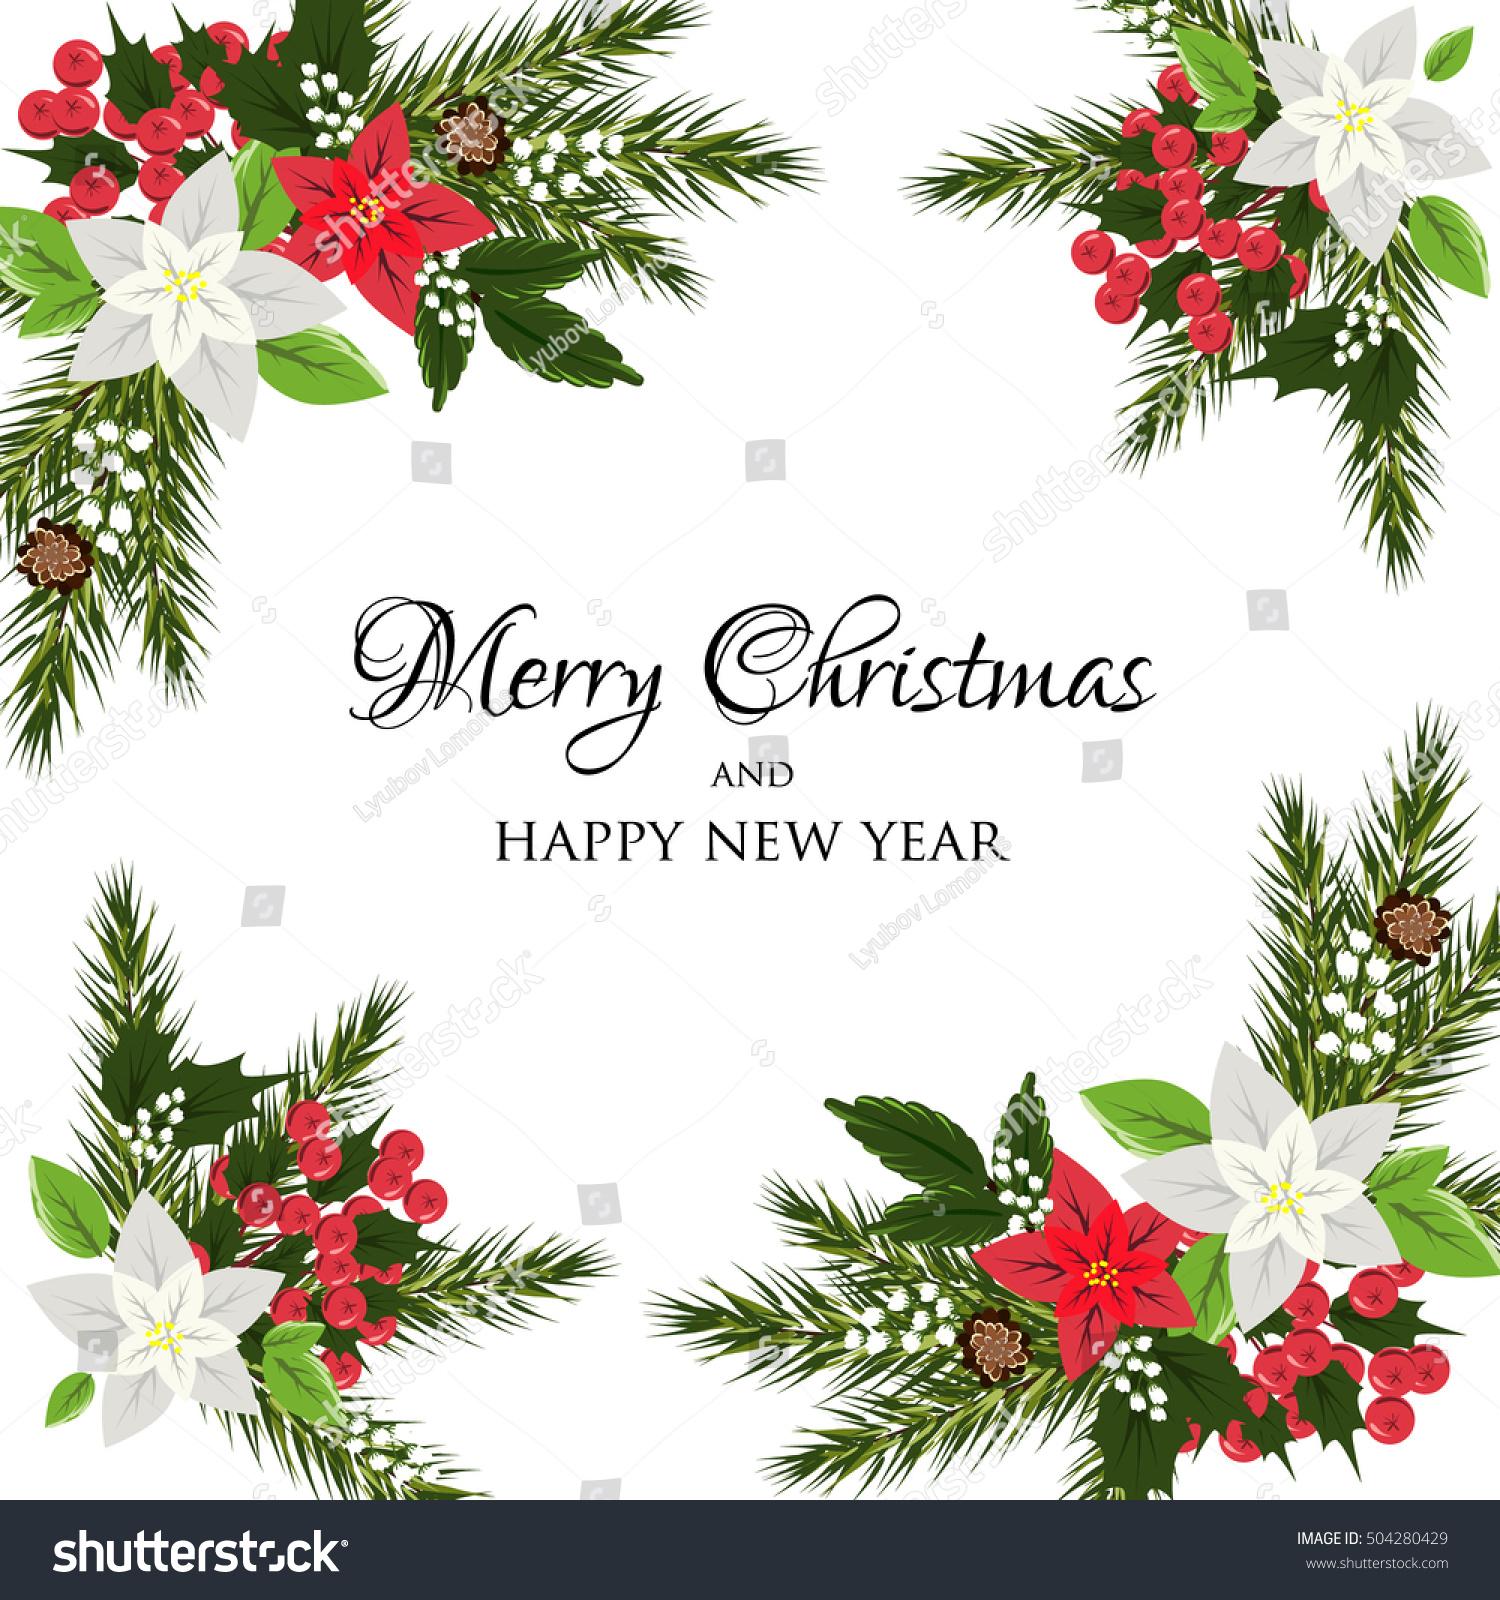 Christmas Party Invitation Holiday Wreath Poinsettia Stock Vector HD ...